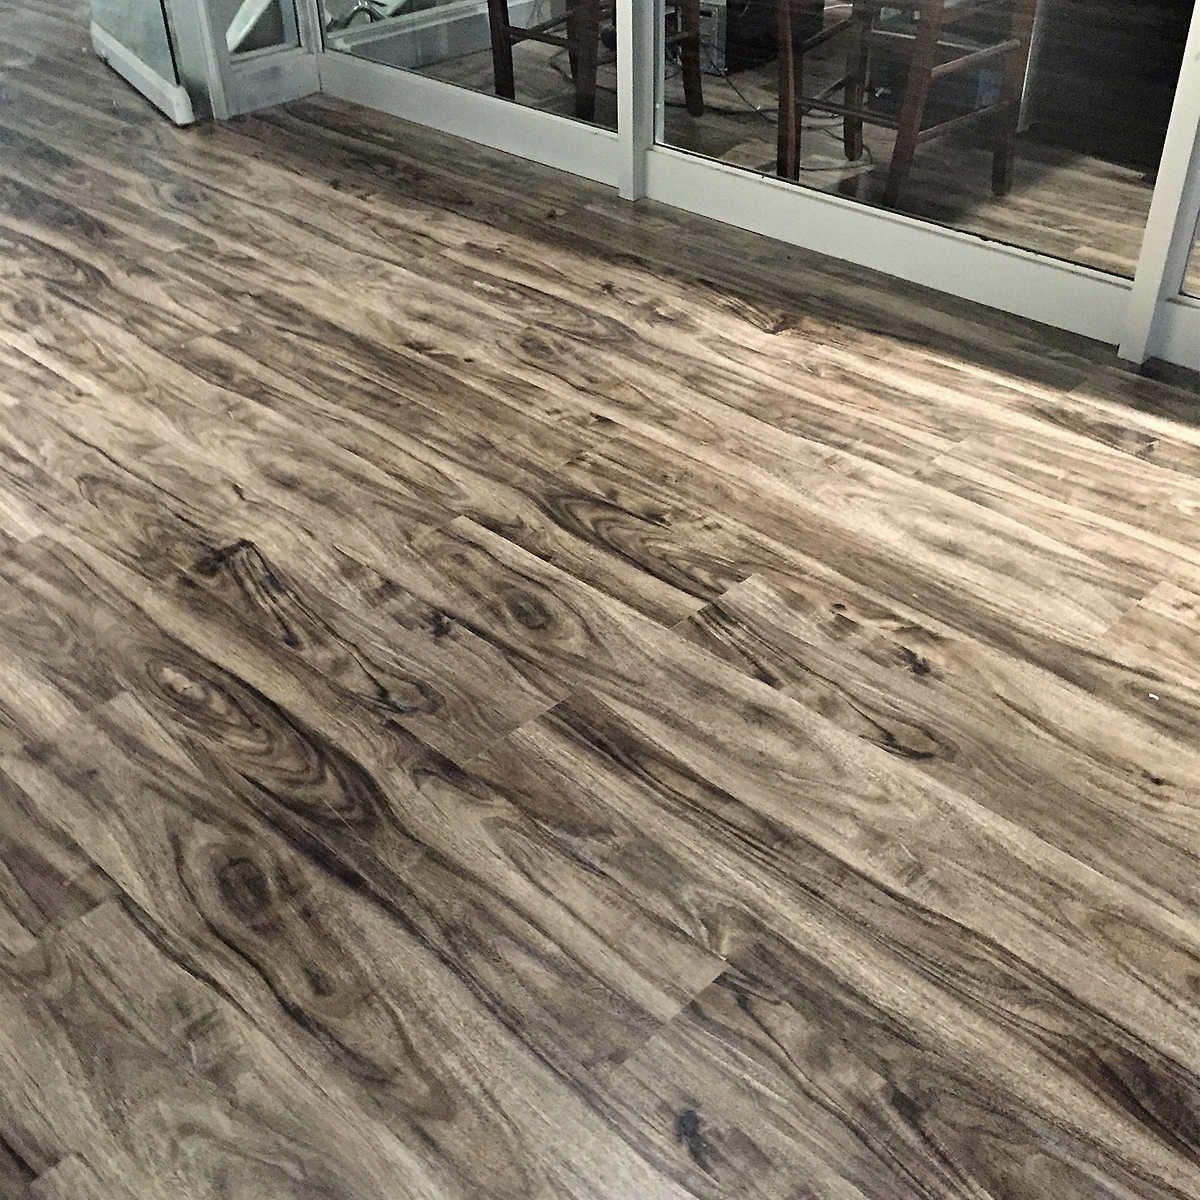 Drifted acacia power click flooring luxury vinyl tile system drifted acacia power click flooring luxury vinyl tile system dailygadgetfo Images